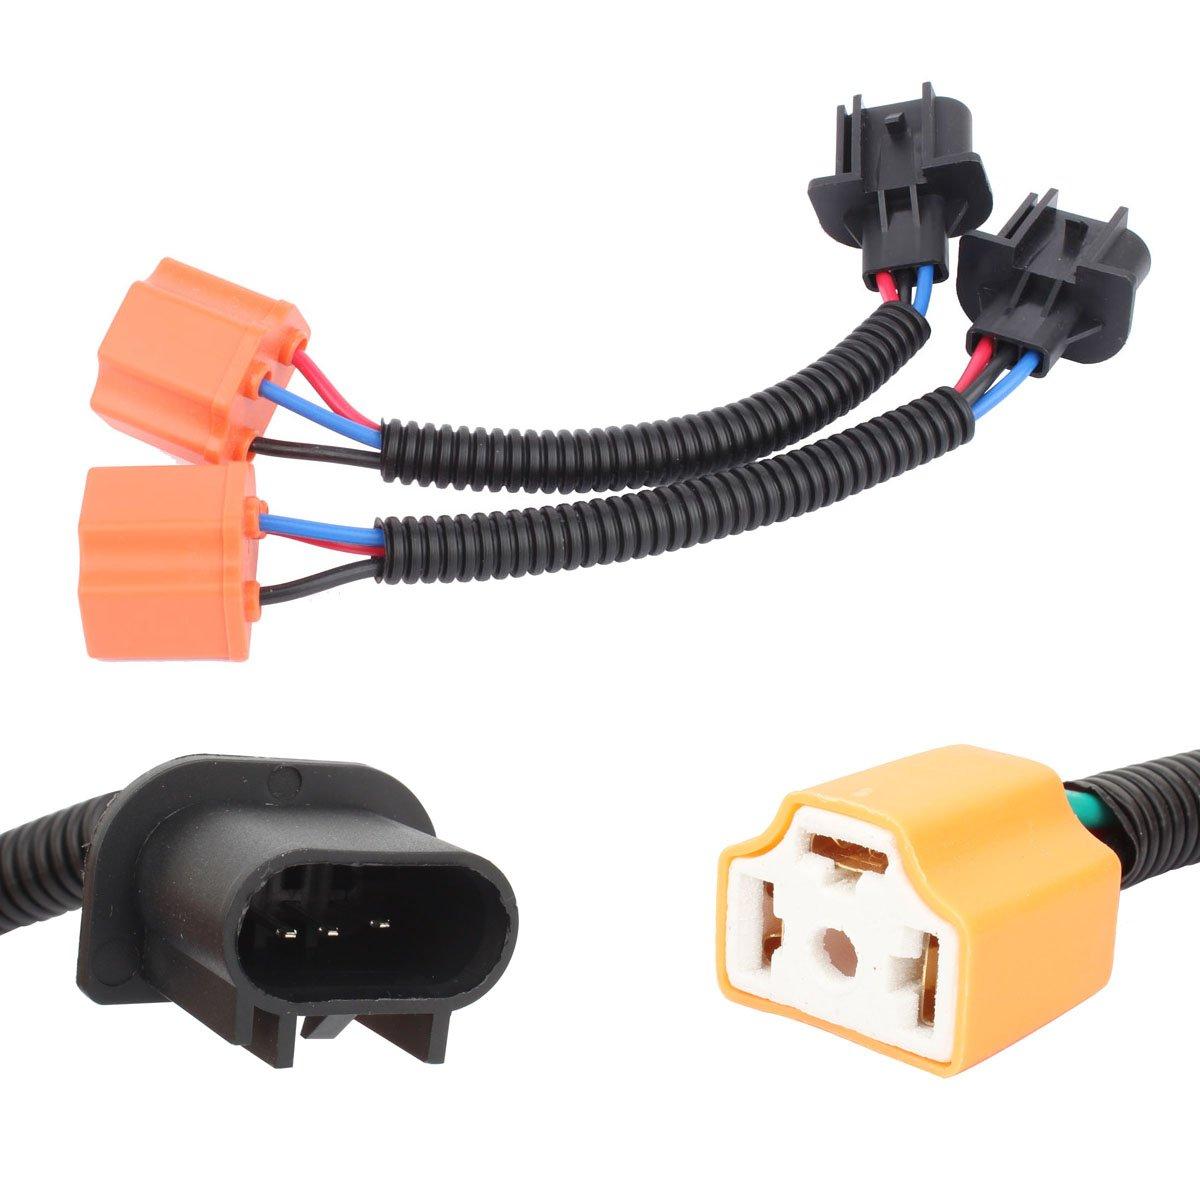 Amazon.com: TOMALL H13 9008 Male to H4 9003 Female Ceramics Retrofit Extension  Wiring Harness Socket Adapter for Jeep Wrangler JK TJ LED Headlight ...